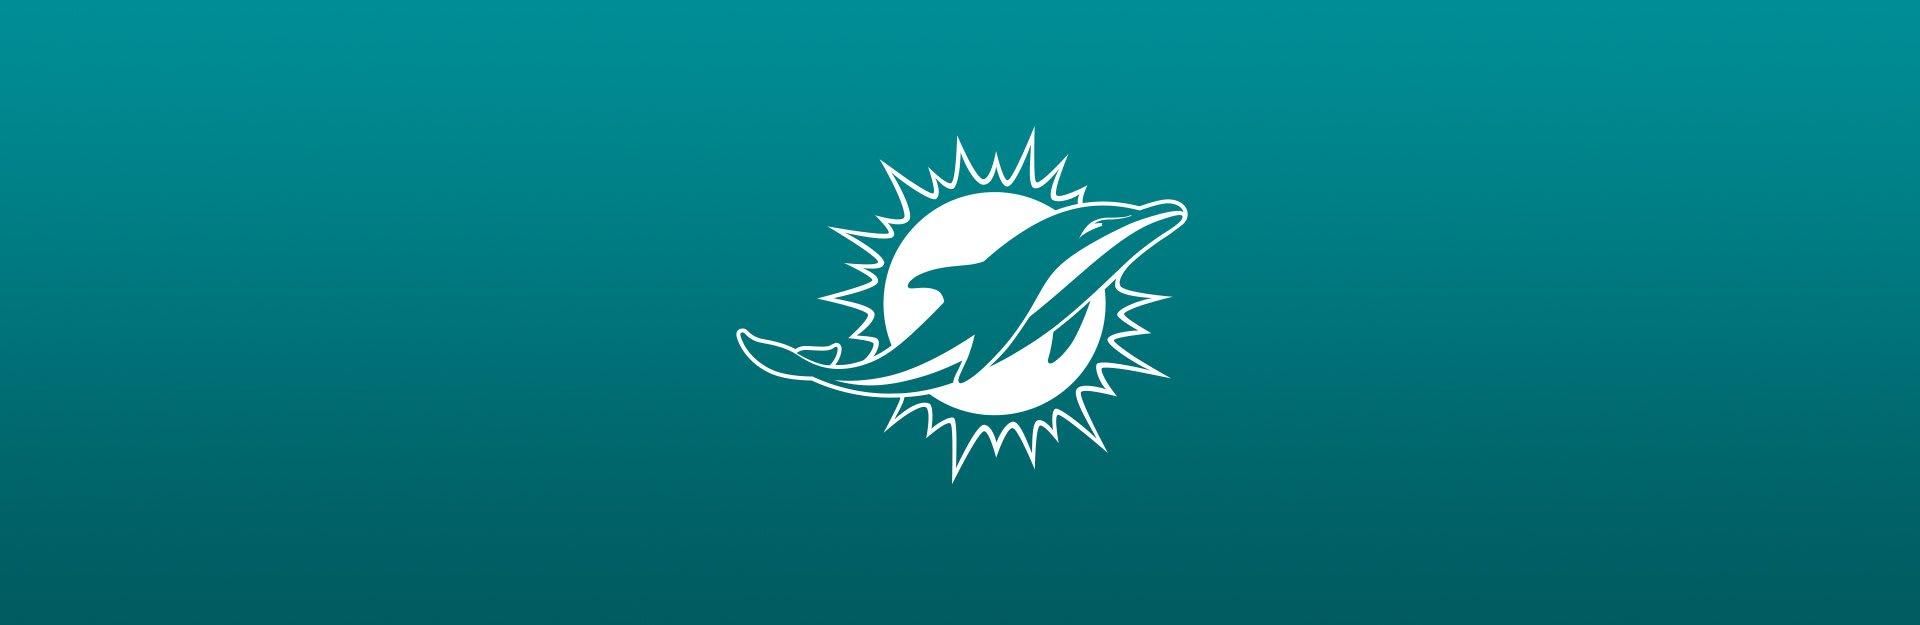 Miami Dolphins logo on blue background